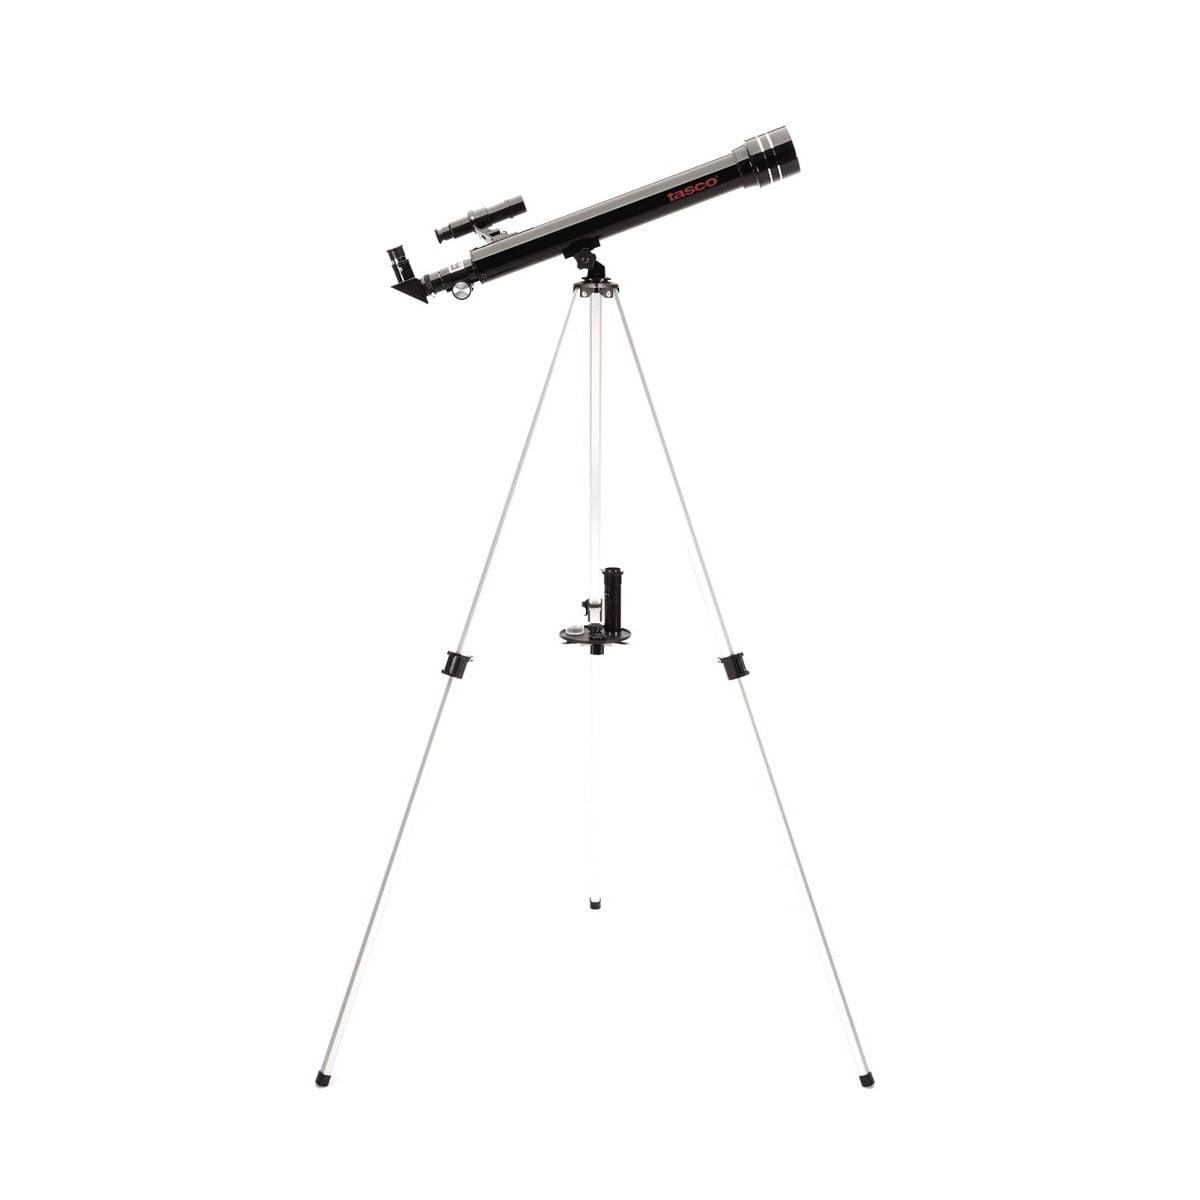 Tasco Novice Refractor 600mm x 50mm Telescope - 30050600